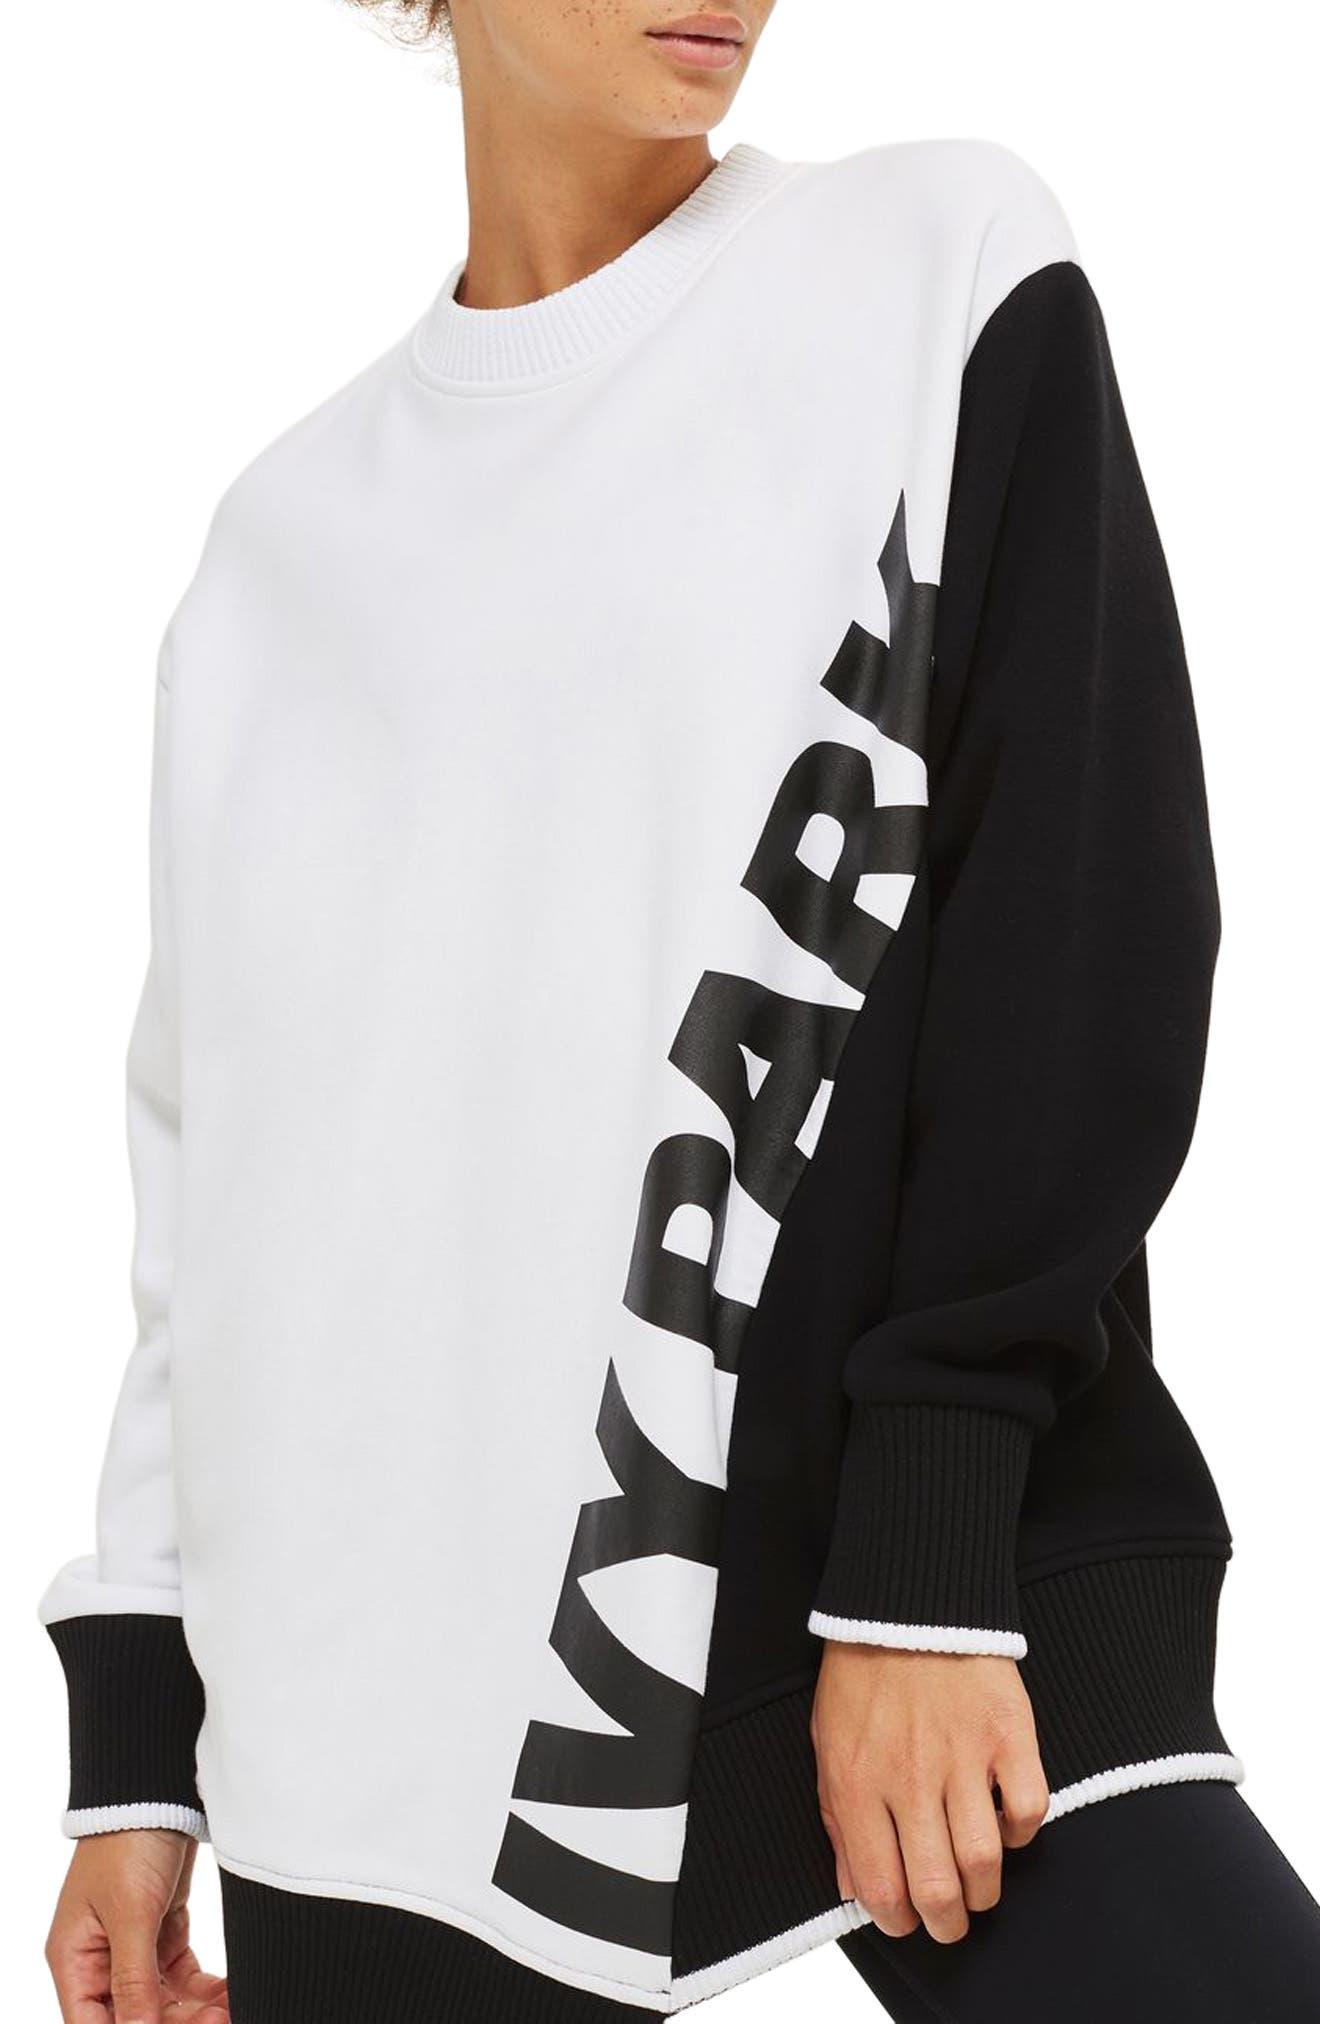 Main Image - IVY PARK® Asymmetrical Logo Sweatshirt